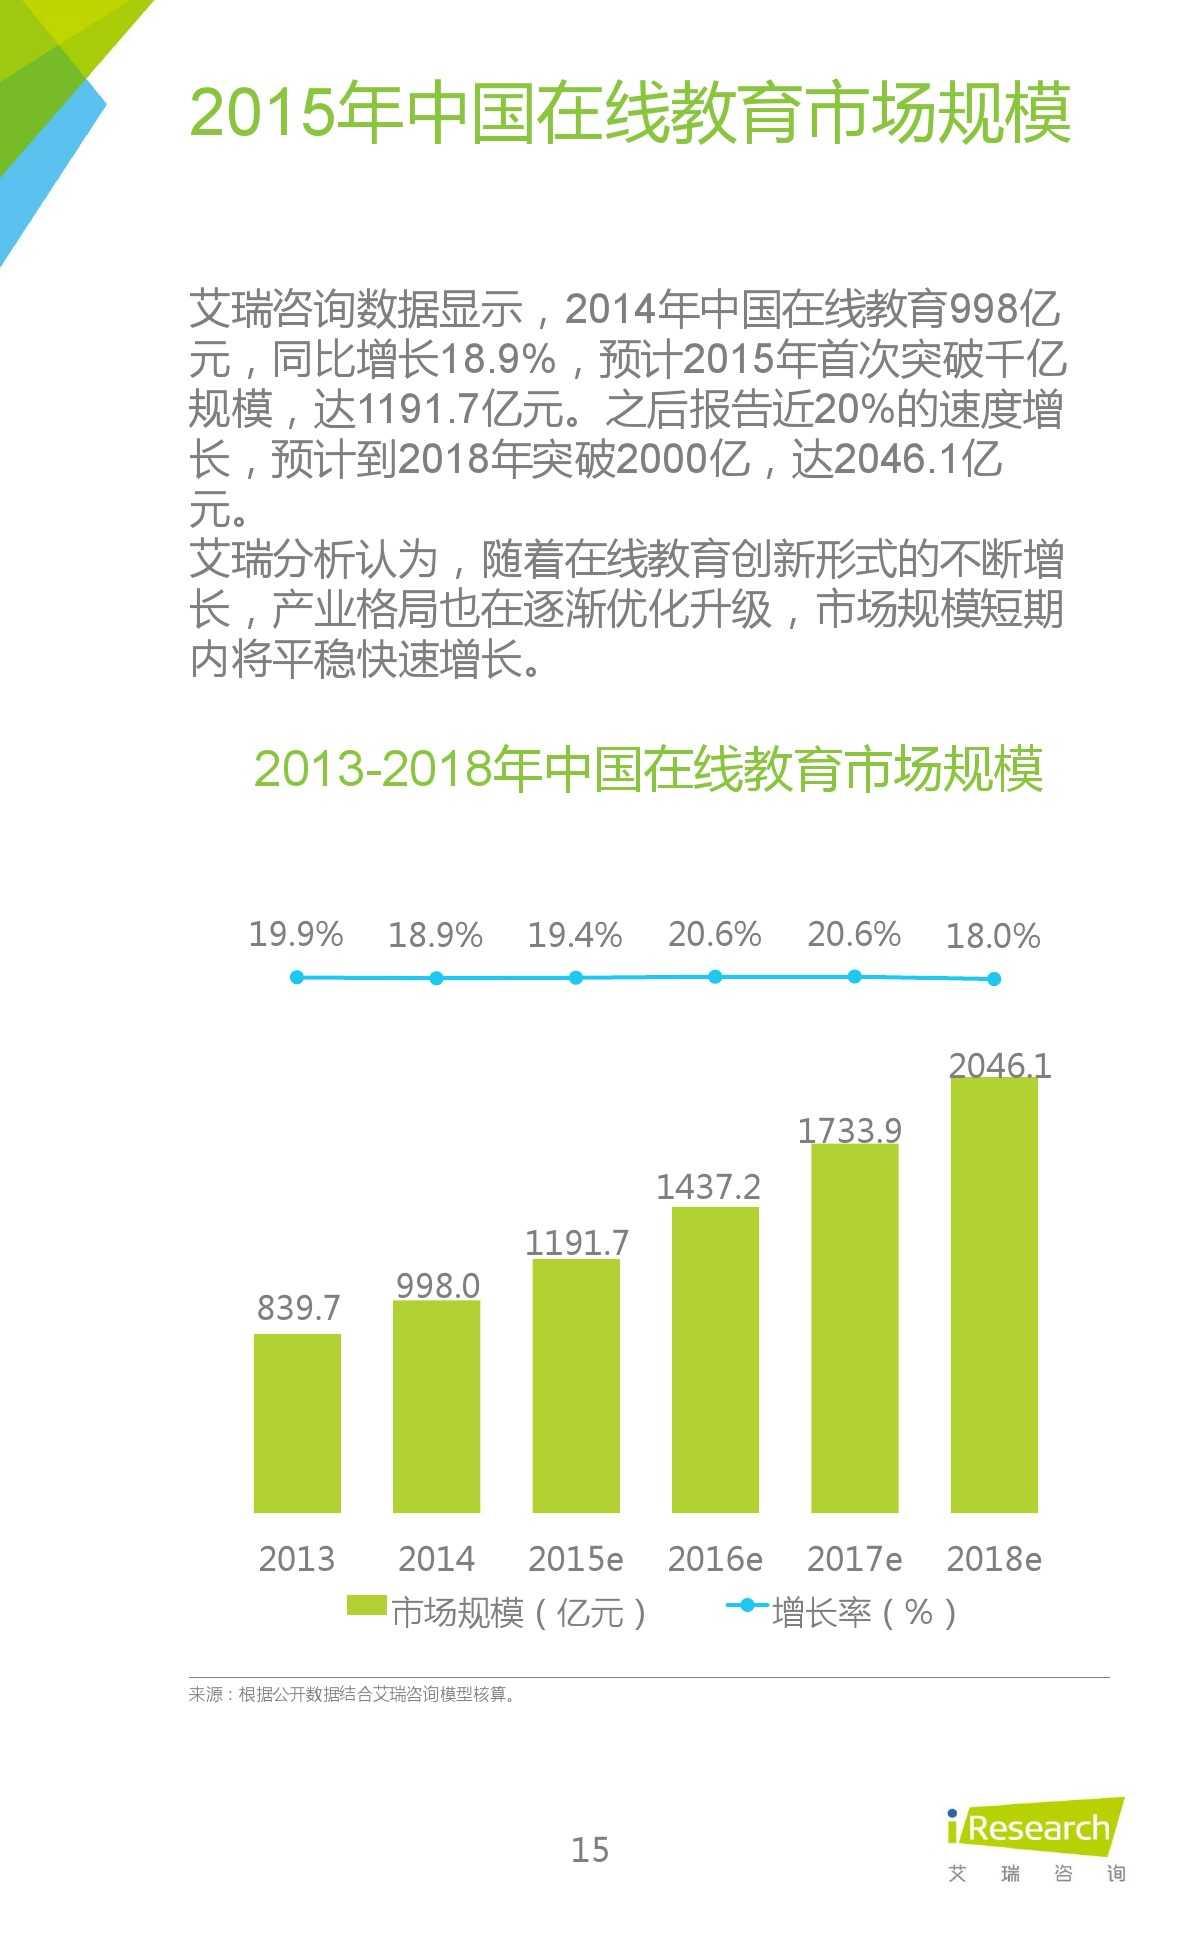 iResearch-2015年中国在线教育平台研究报告_000015